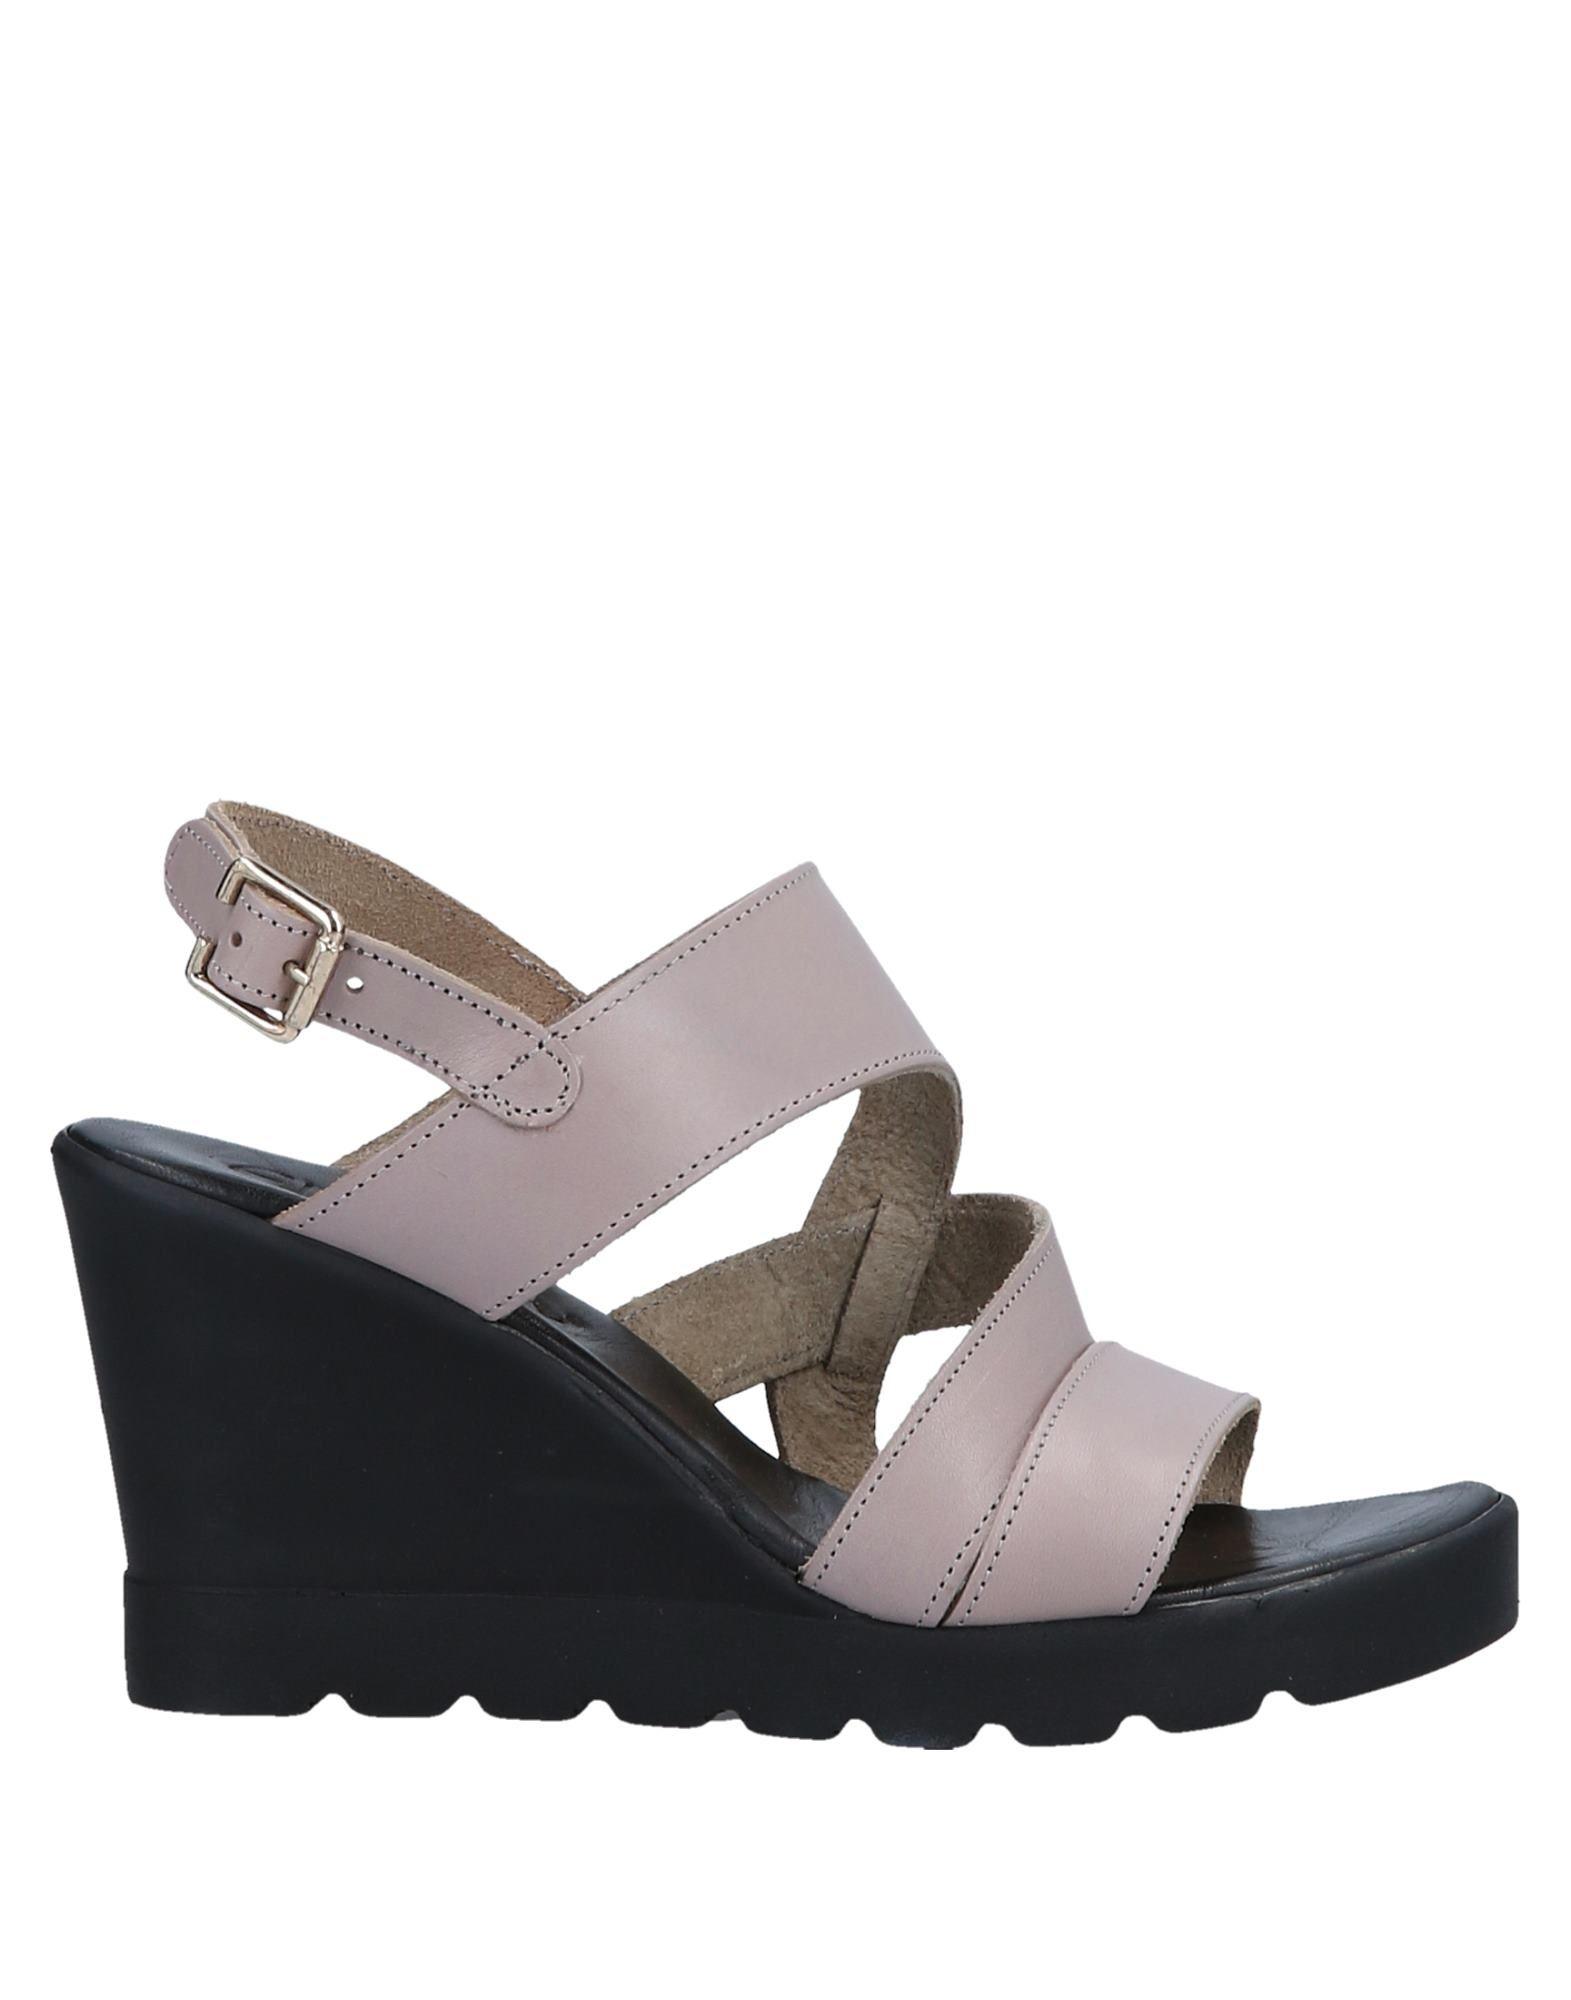 Stivaletti Lea-Gu Donna - scarpe 11509762AV Nuove offerte e scarpe - comode d1f186